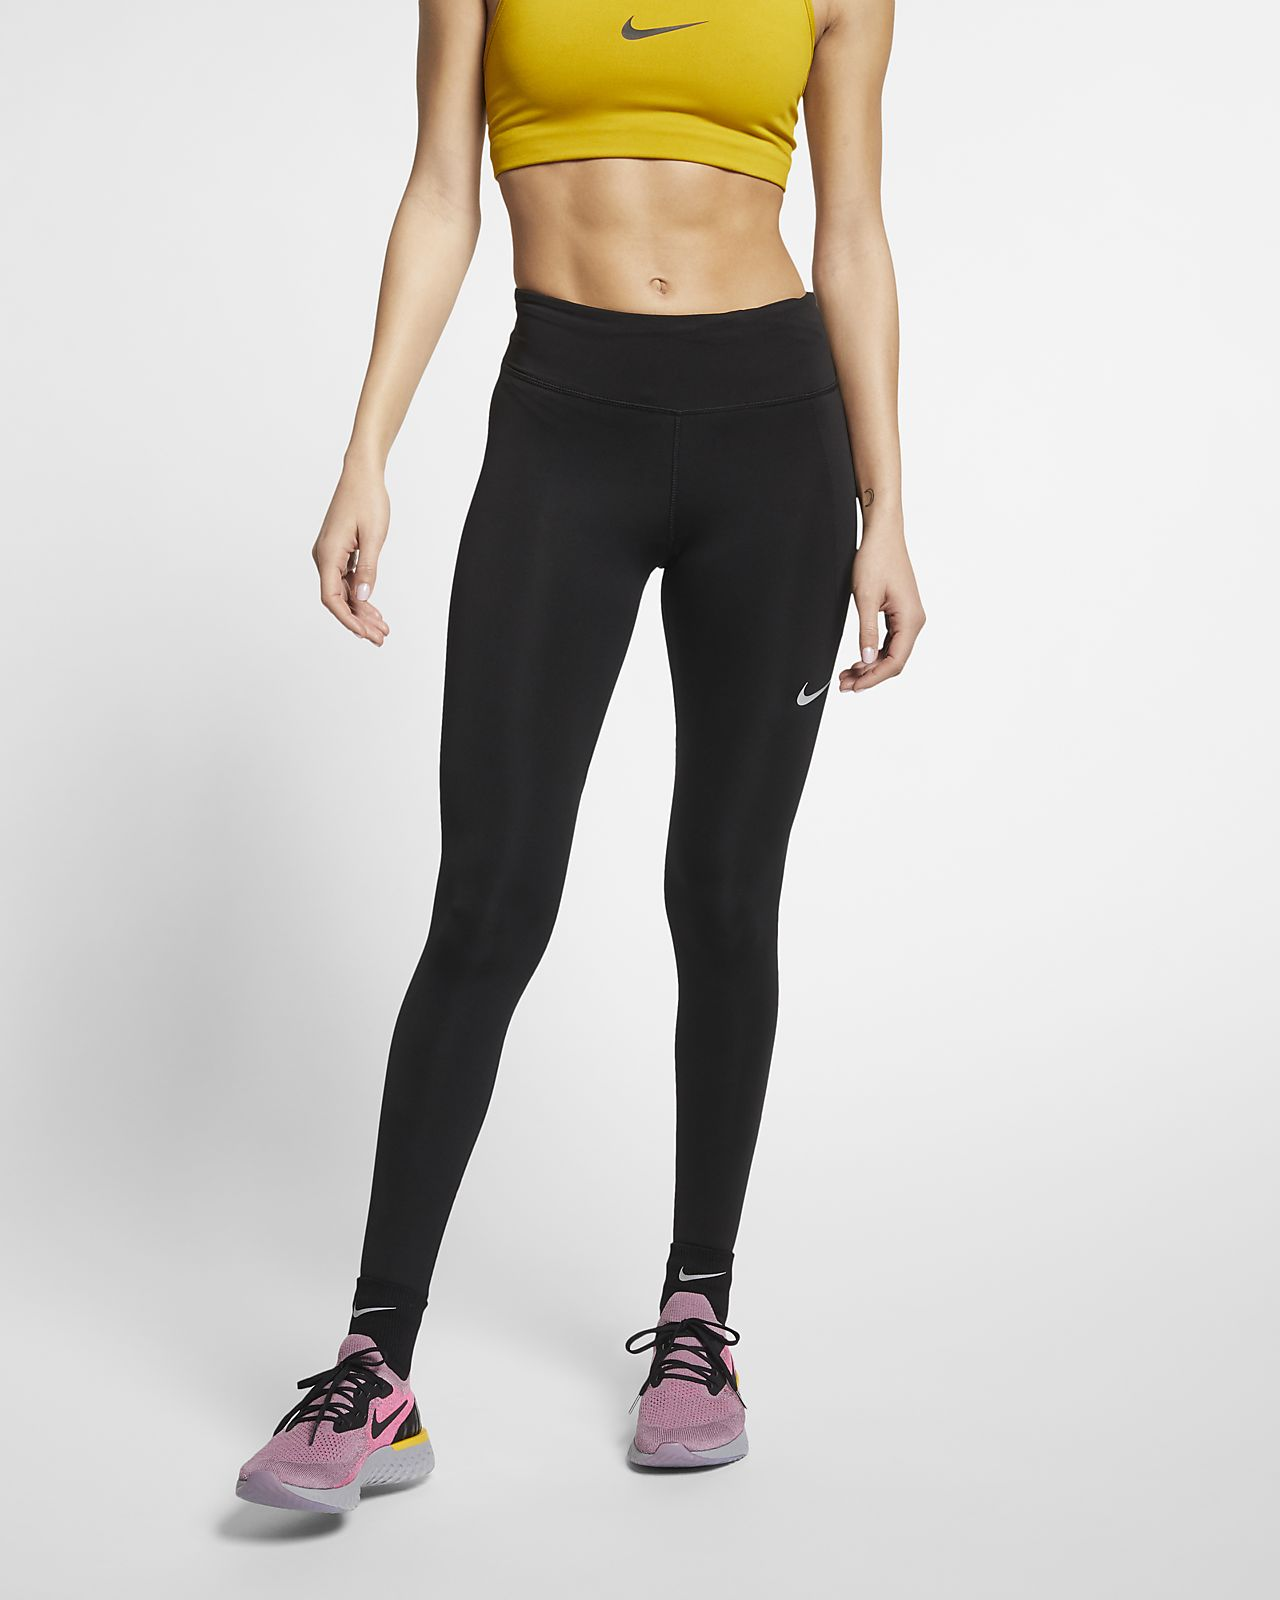 Damskie legginsy do biegania Nike Fast